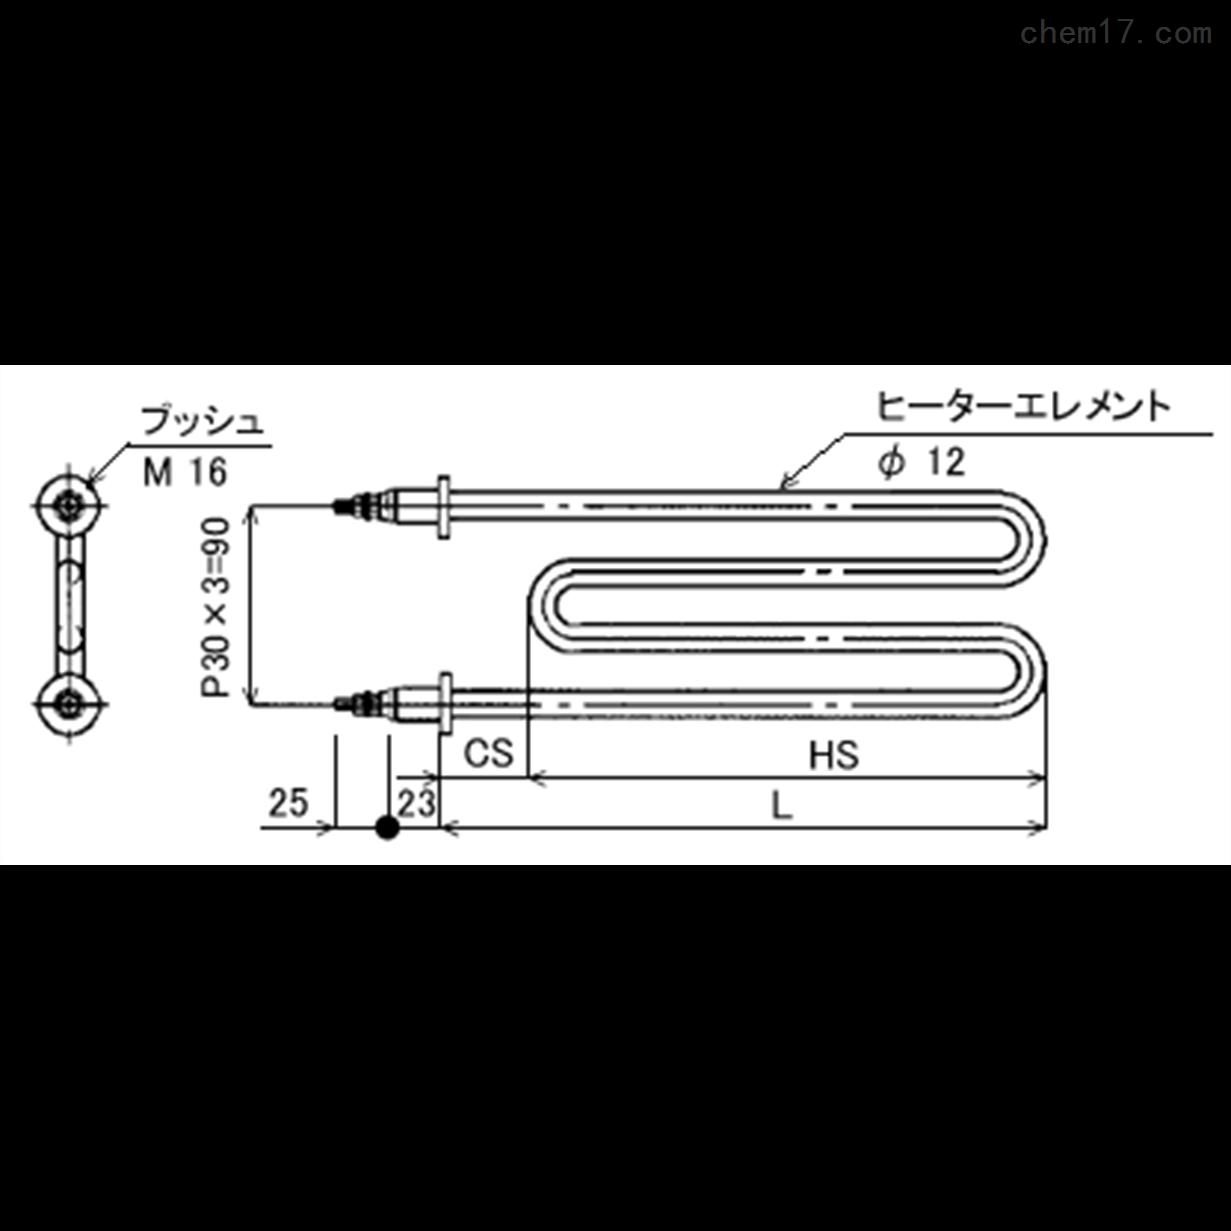 日本just液体加热,LMB全不锈钢M型加热器